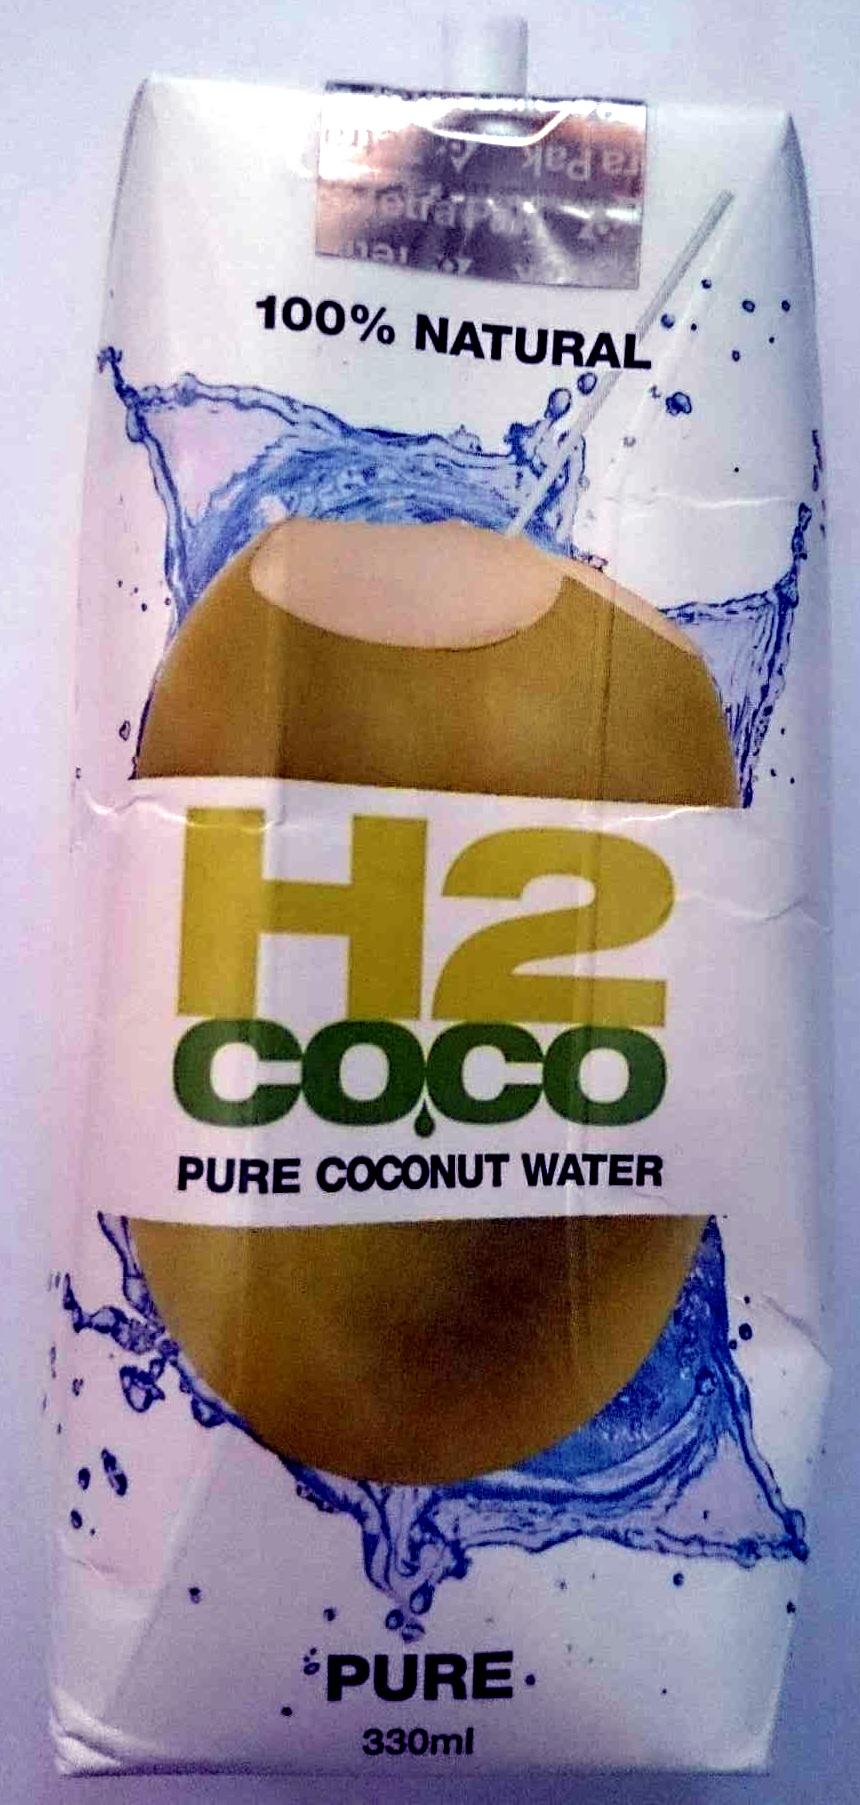 H2 Coco Pure Coconut Water - Product - en